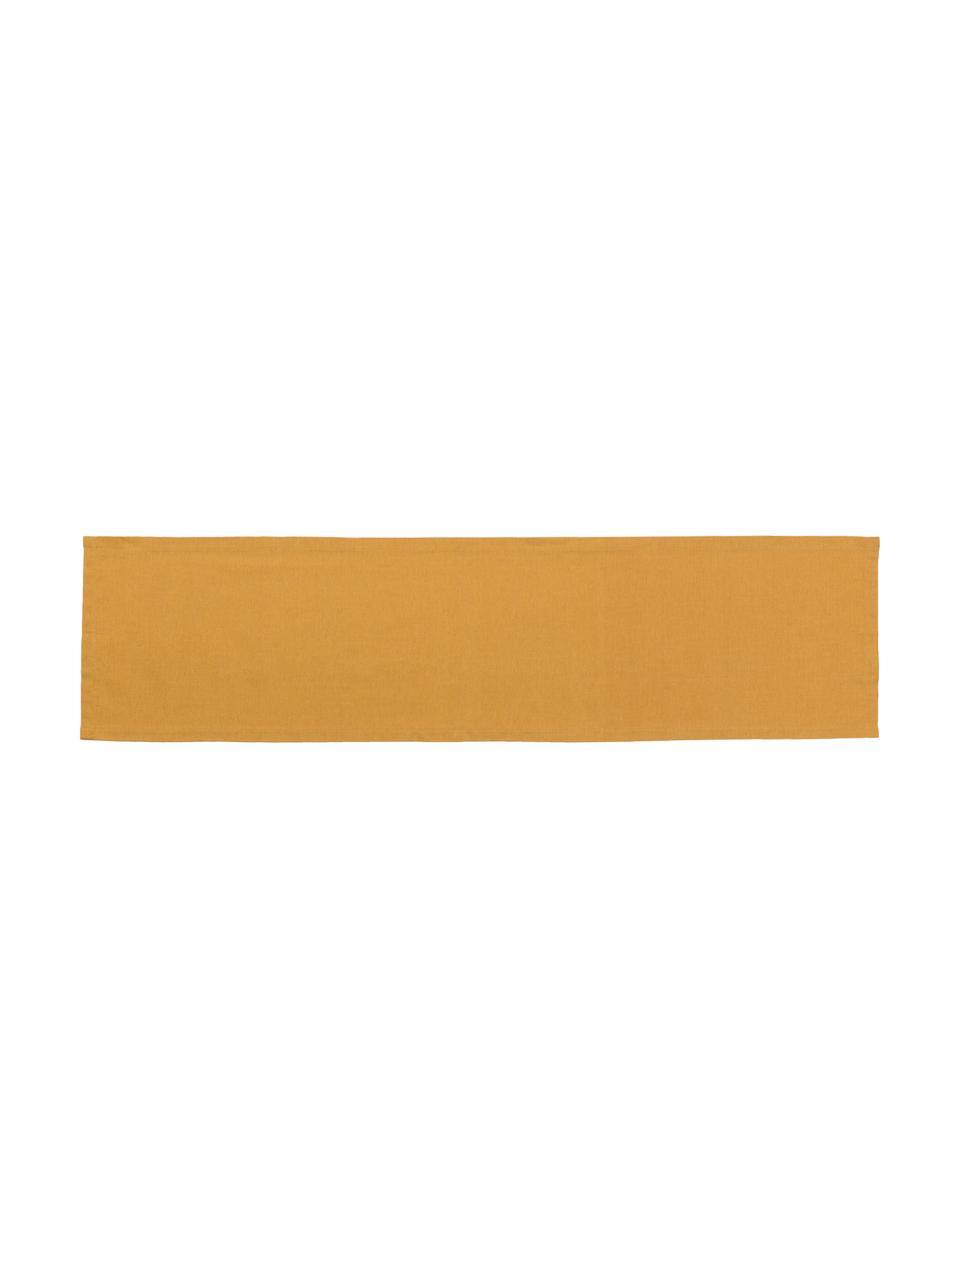 Runner in misto cotone giallo senape Riva, Giallo senape, Larg. 40 x Lung. 150 cm